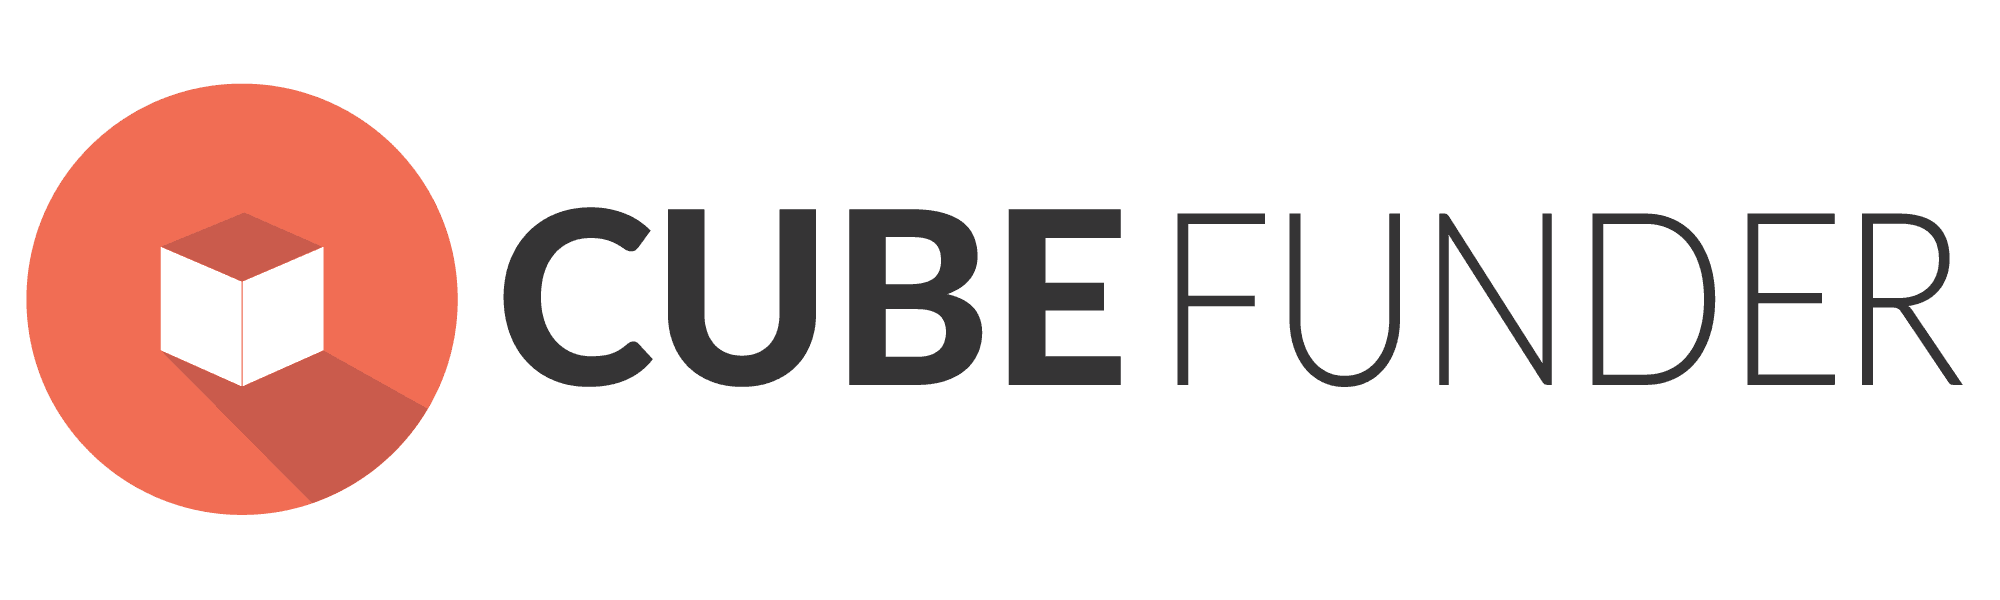 Cubefunder Logo